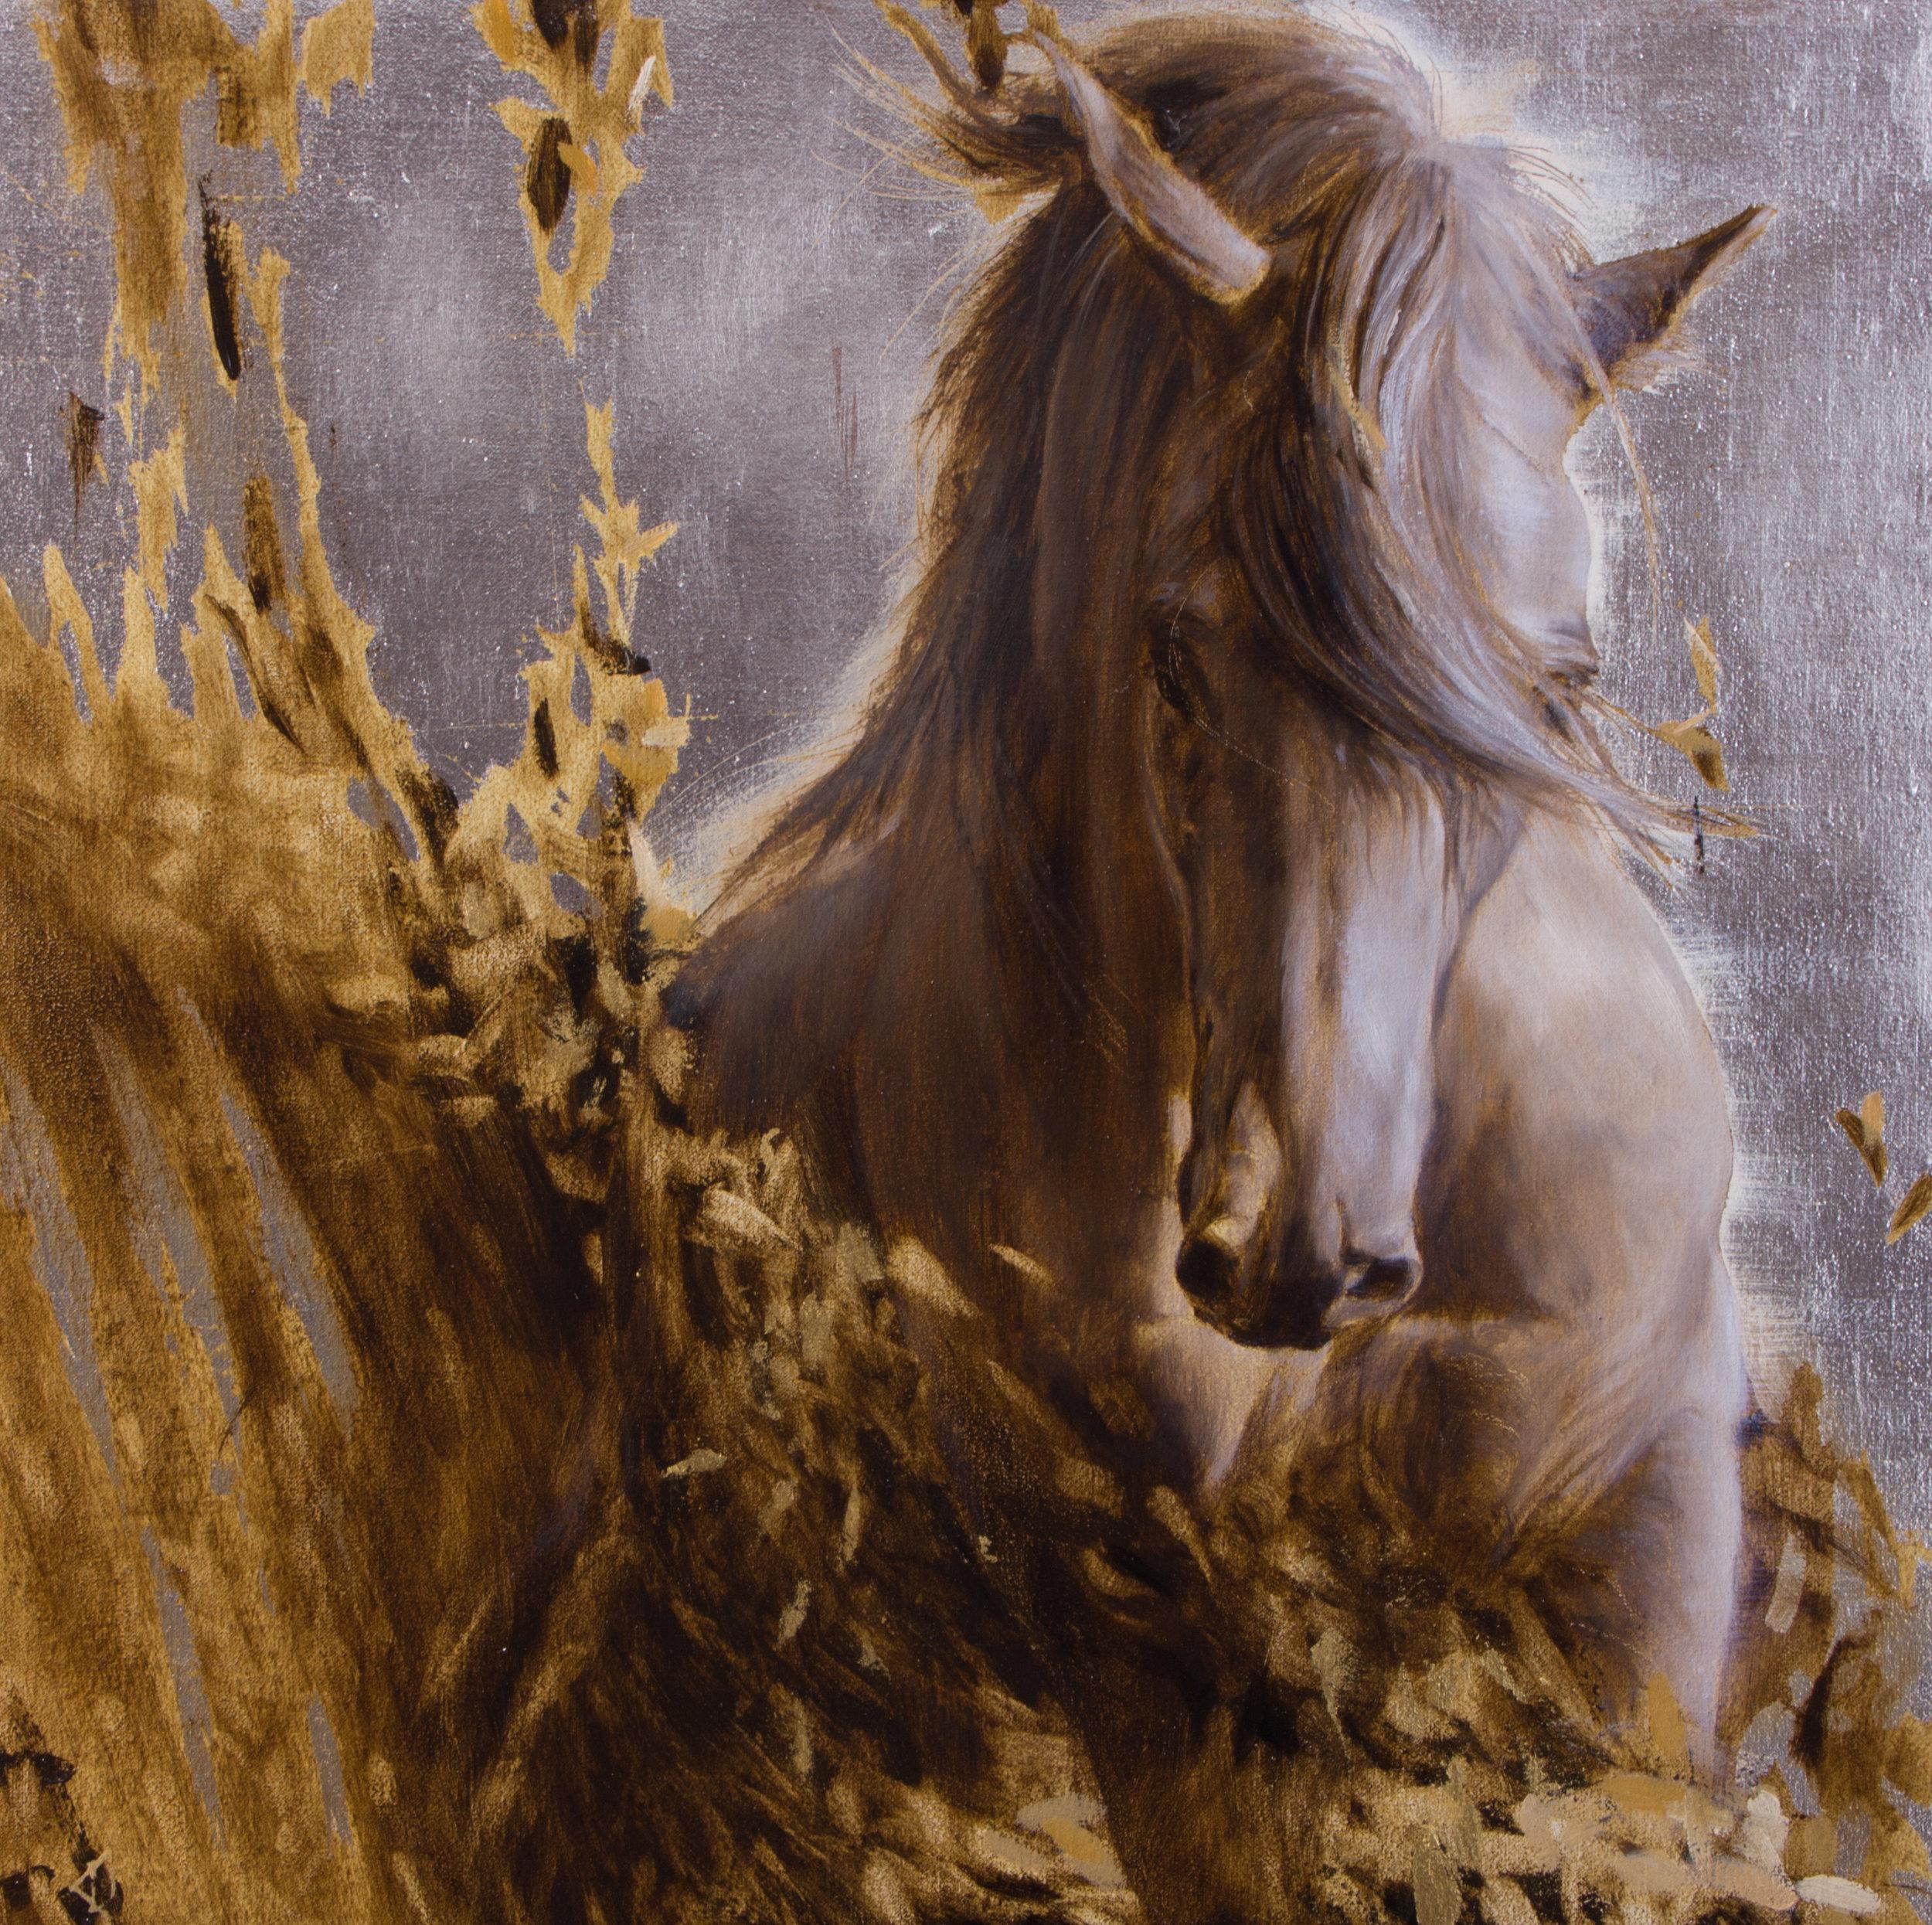 Horses in my Dreams